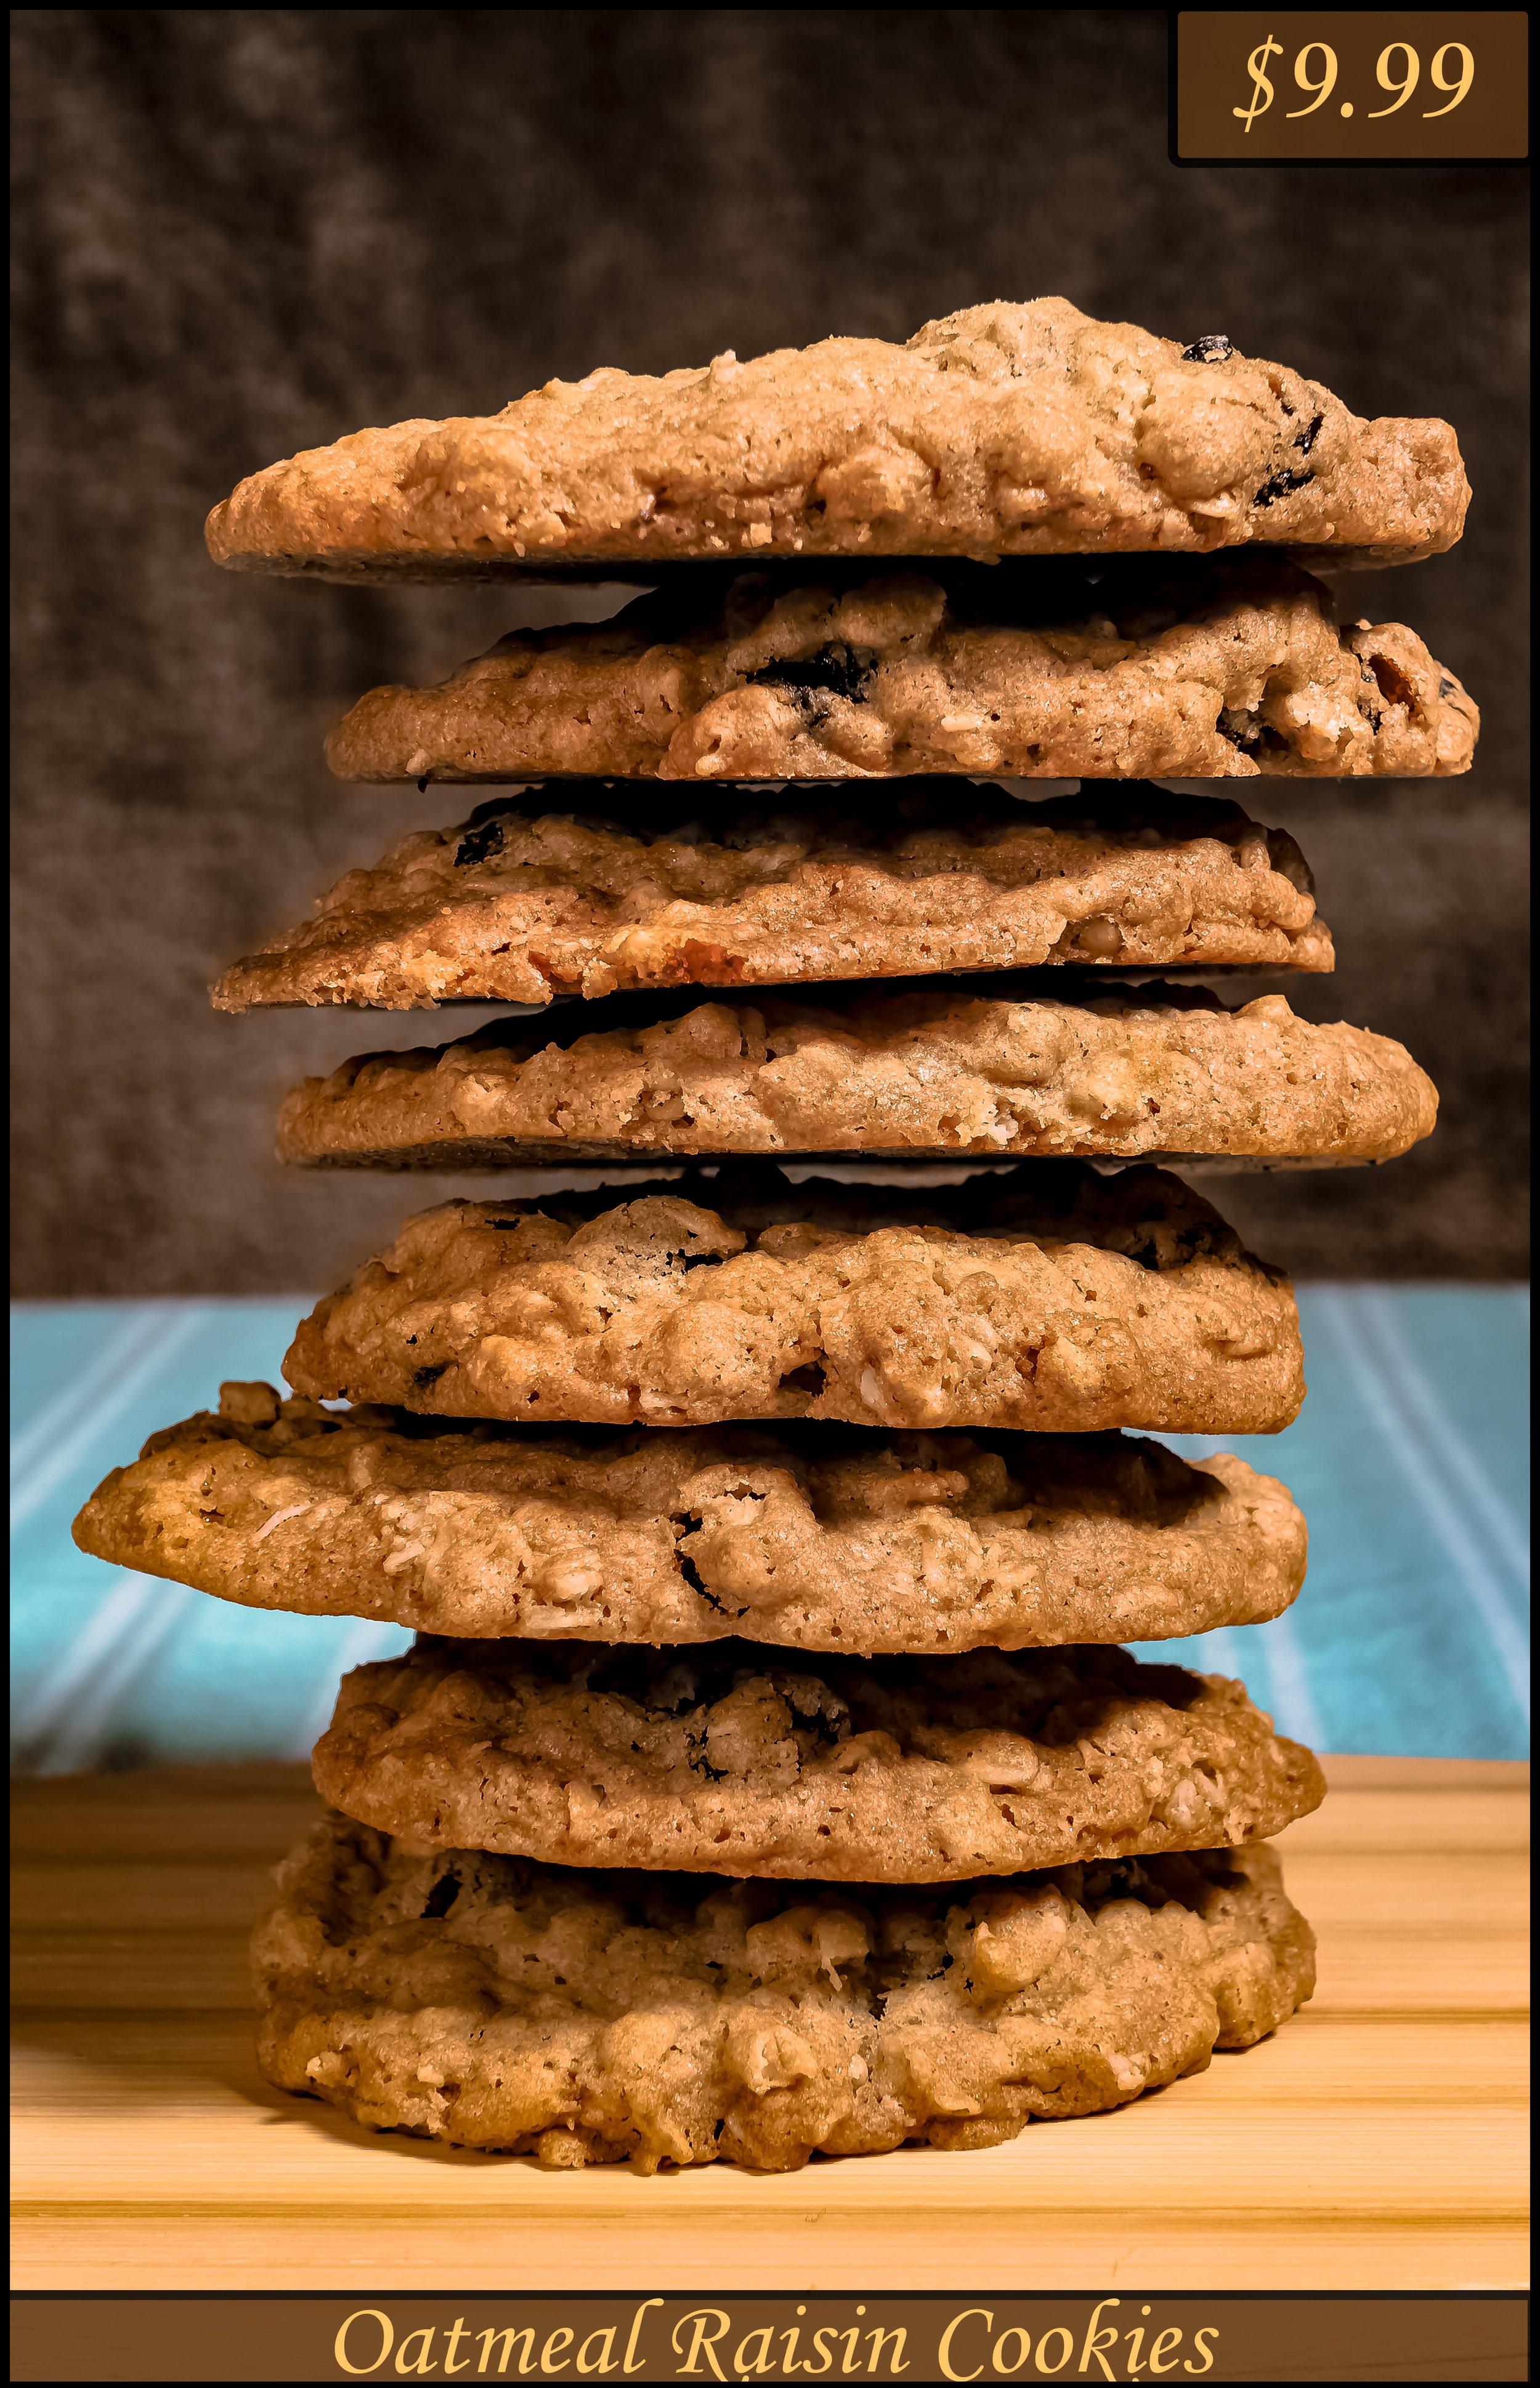 Oatmeal Raisin Cookies.jpg